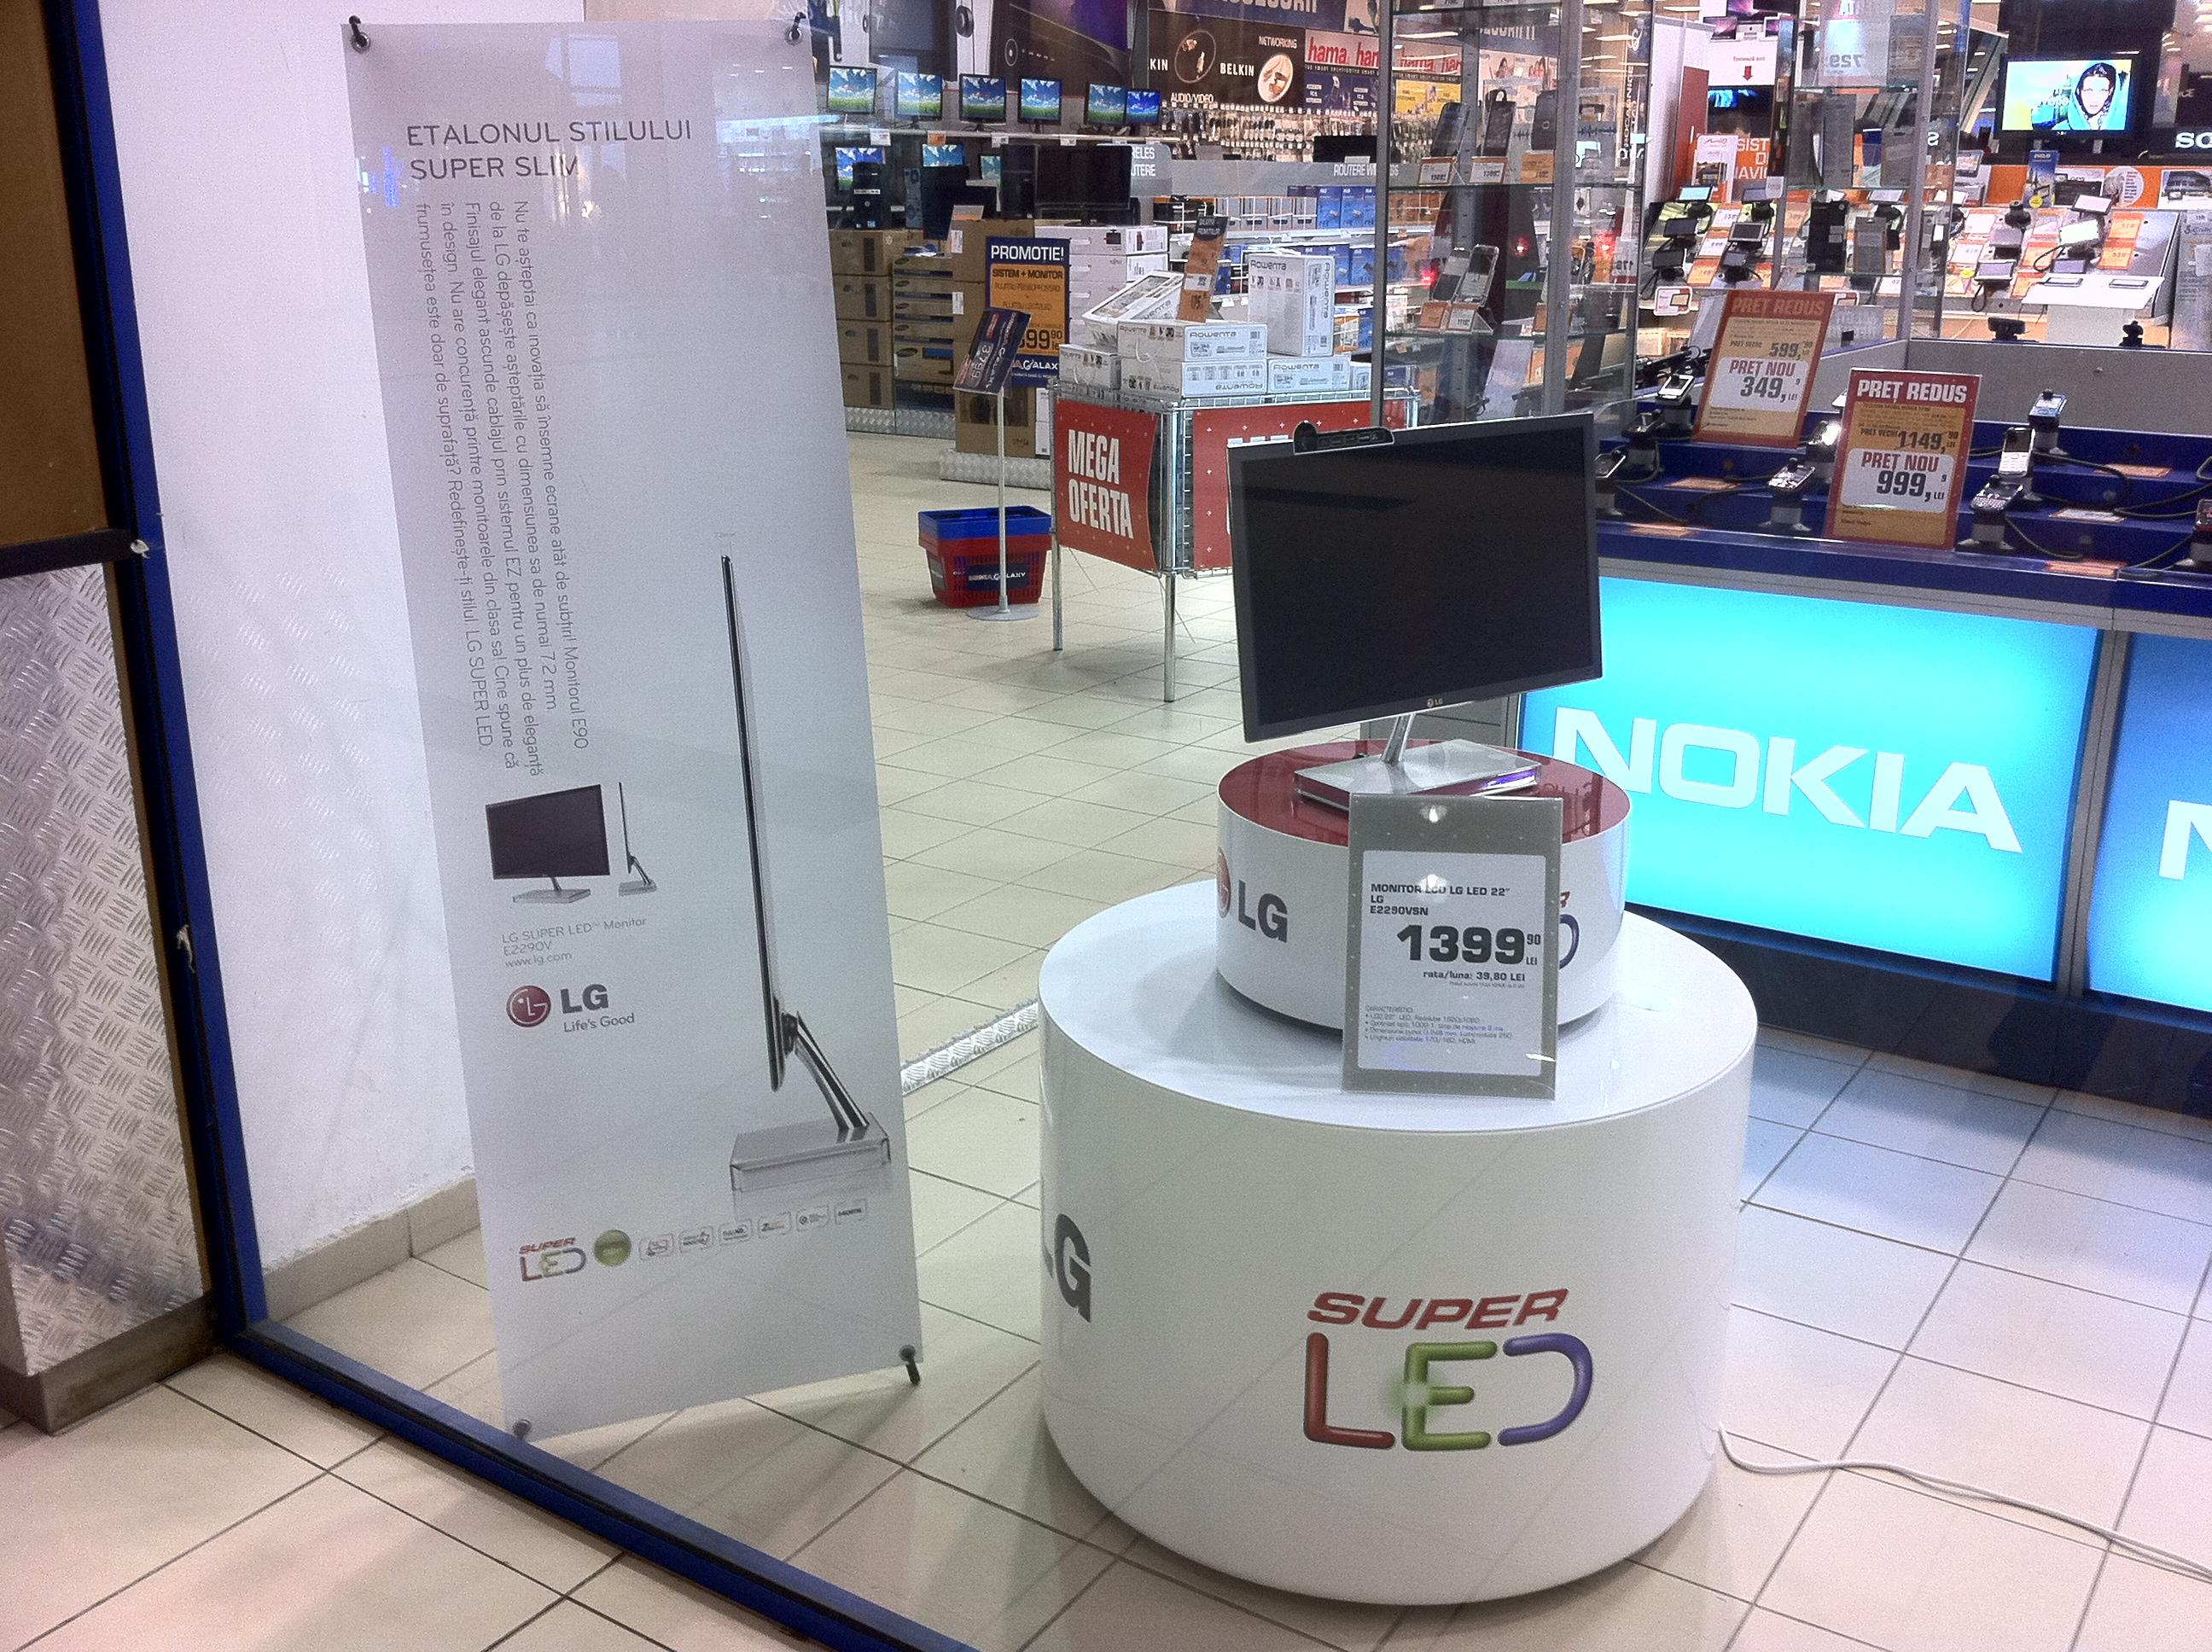 LG displaying its 22-inch LCD LED monitor model E225OVSN